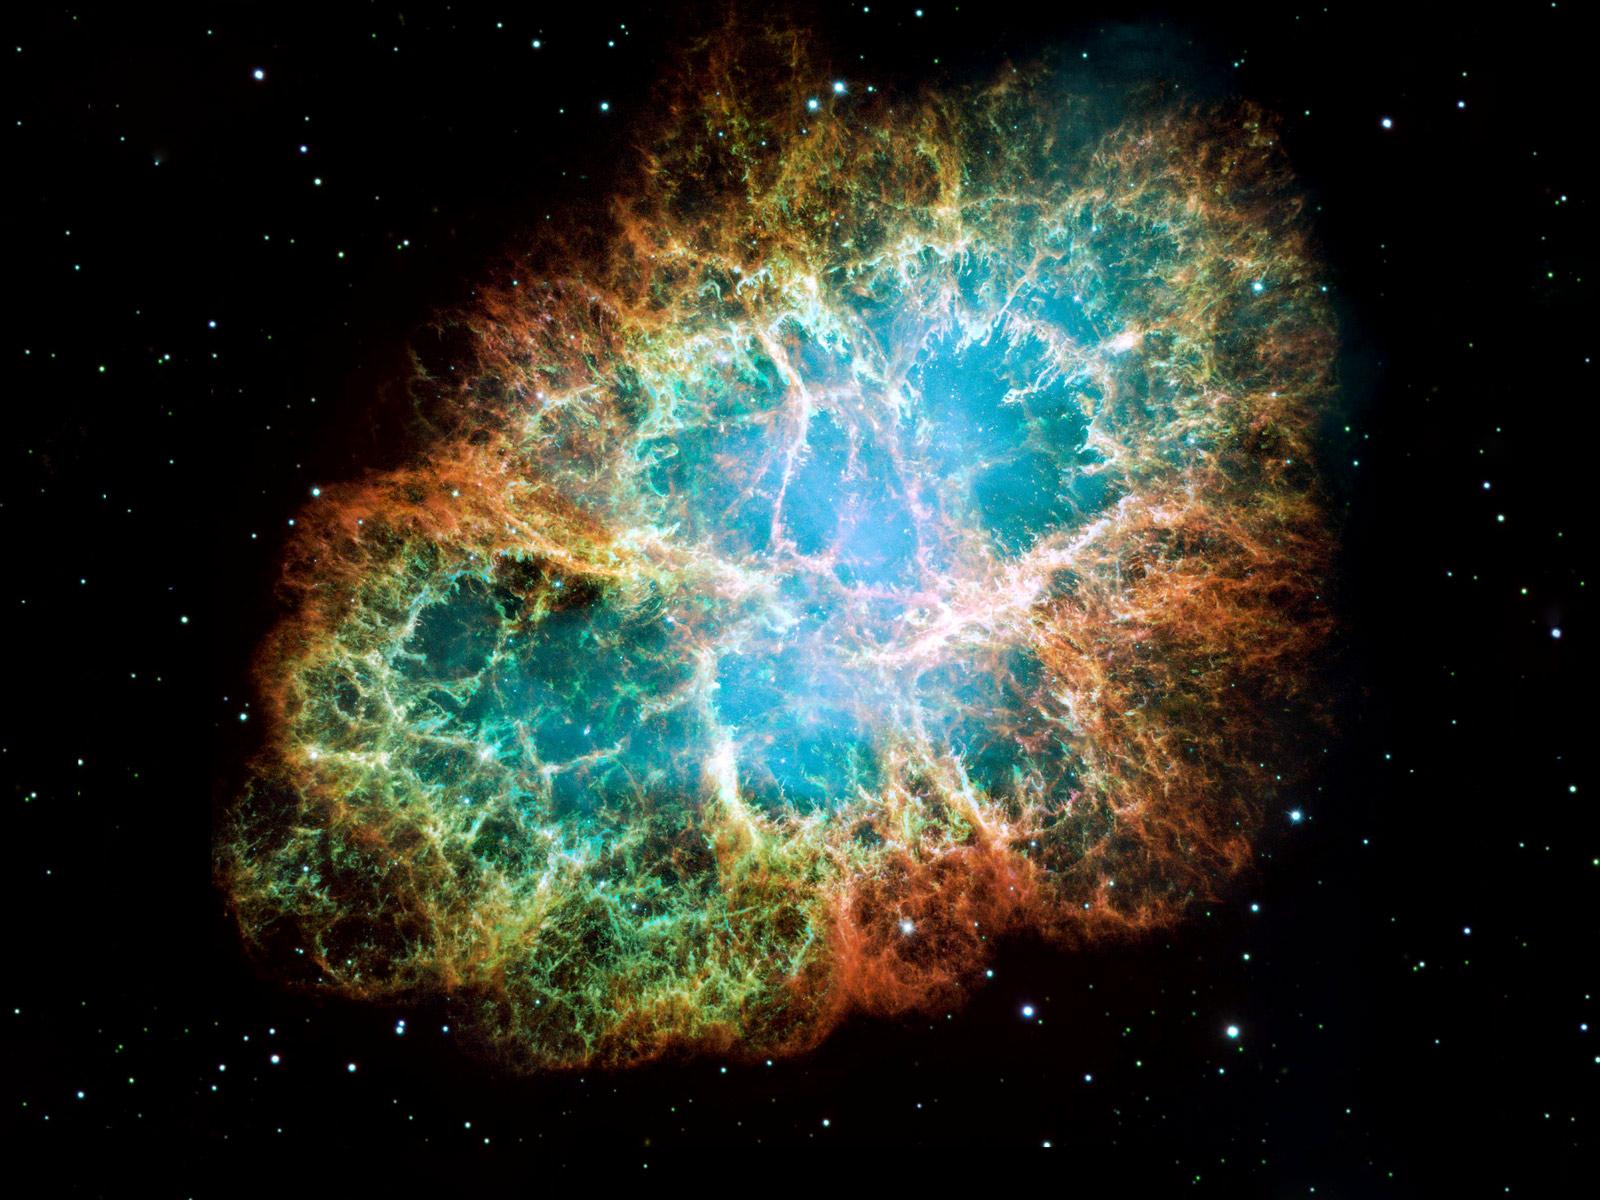 Hubble Space Telescope Crab Bebula 1600x1200